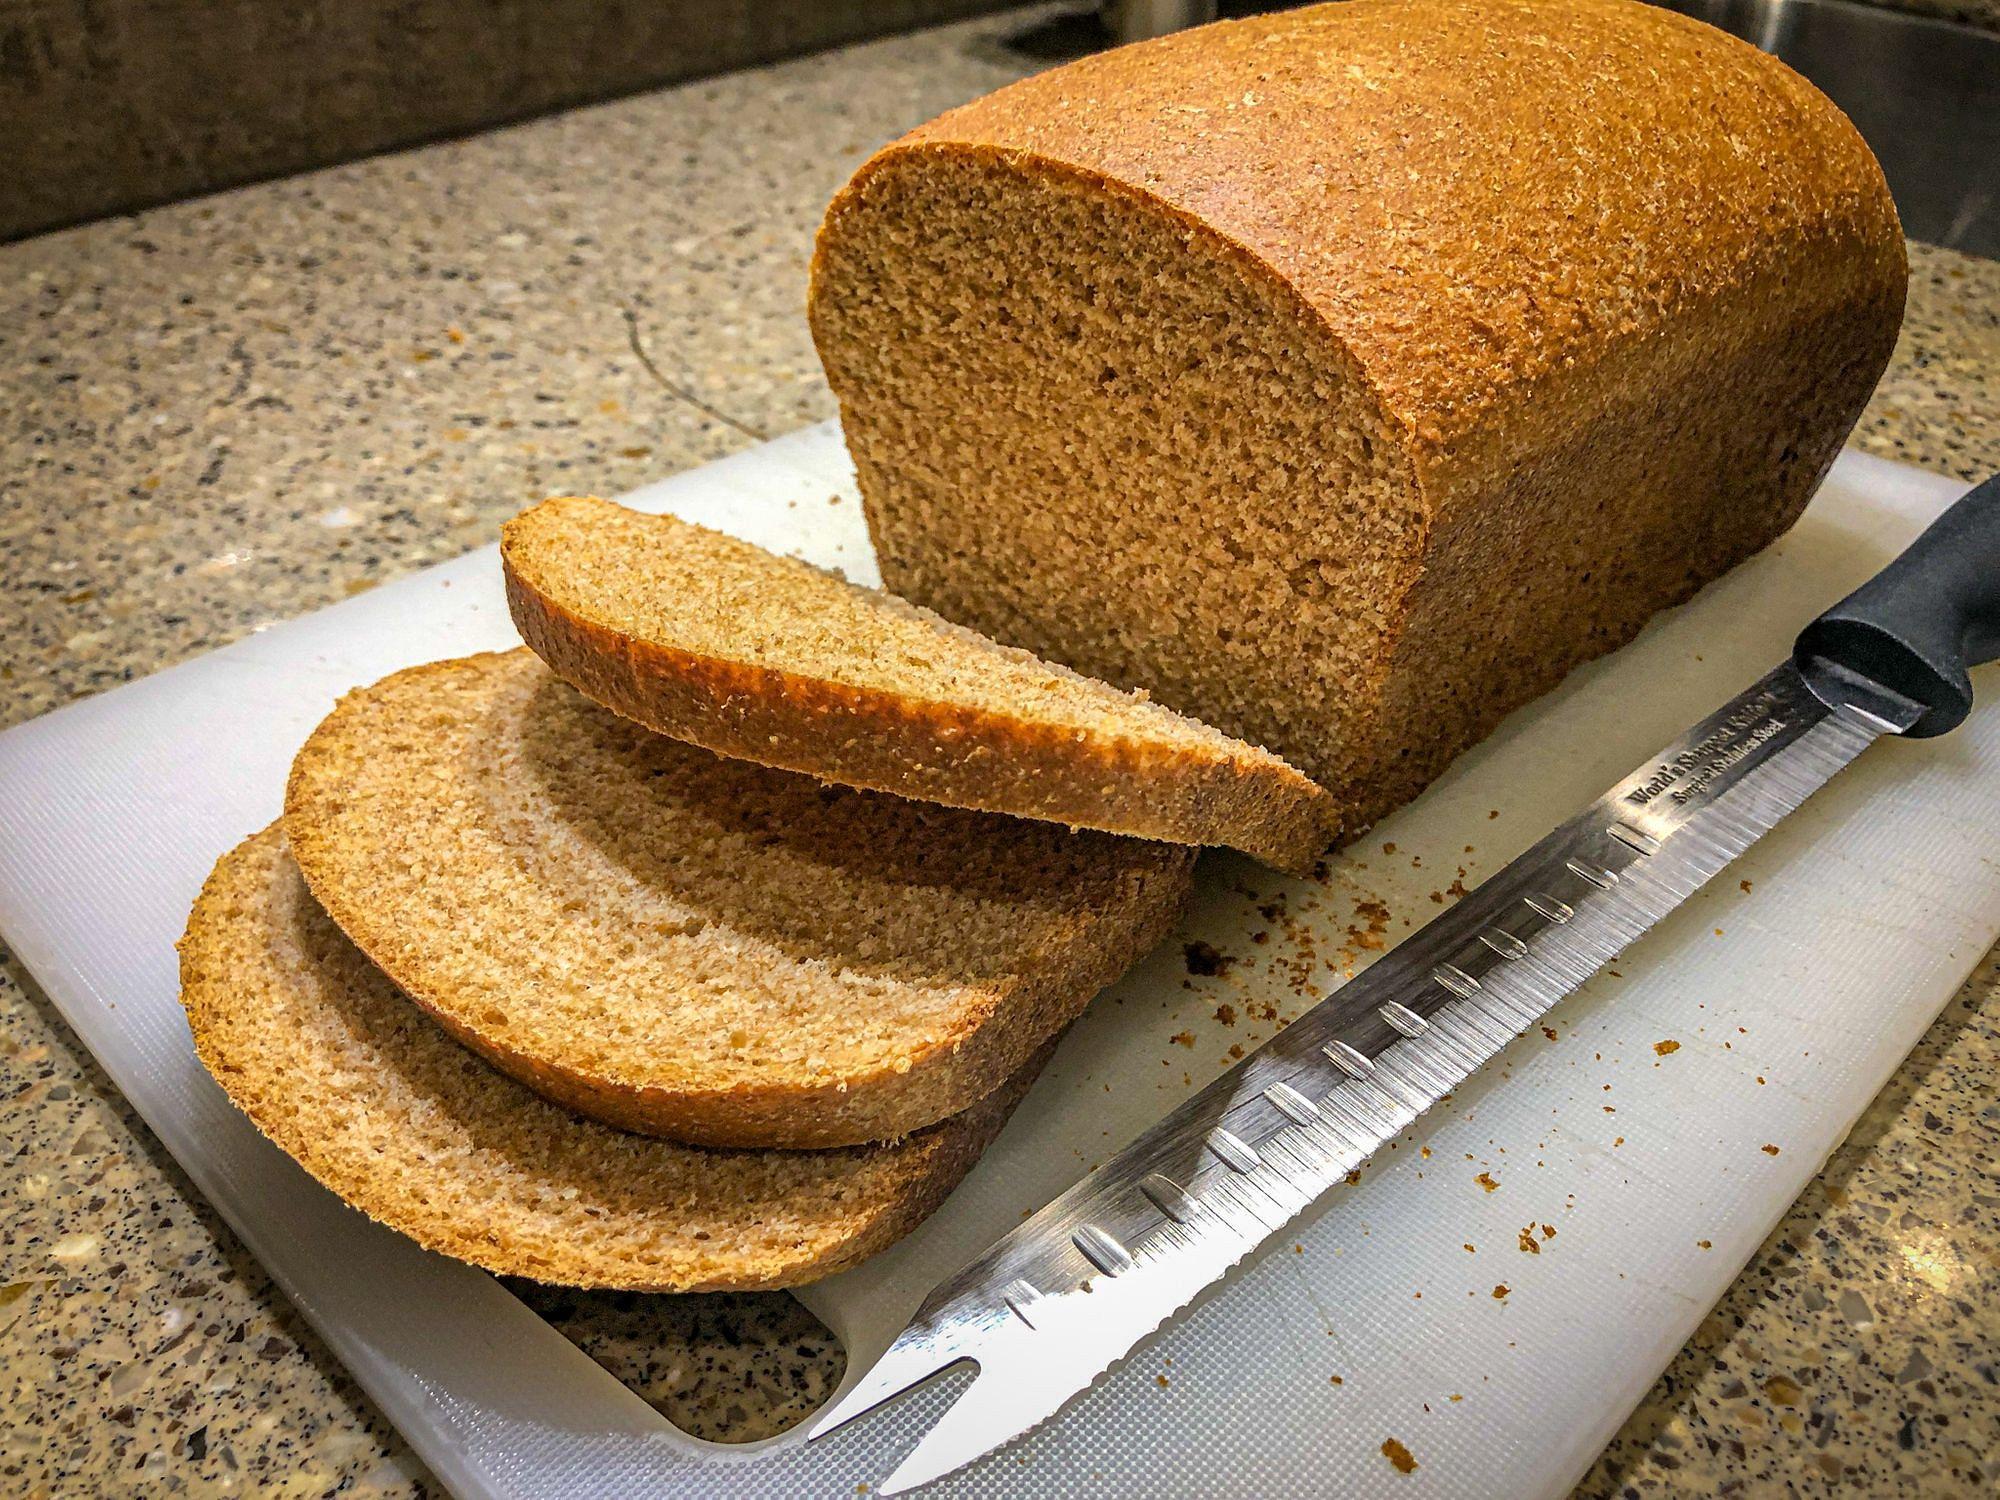 Baking Bread in RV Oven